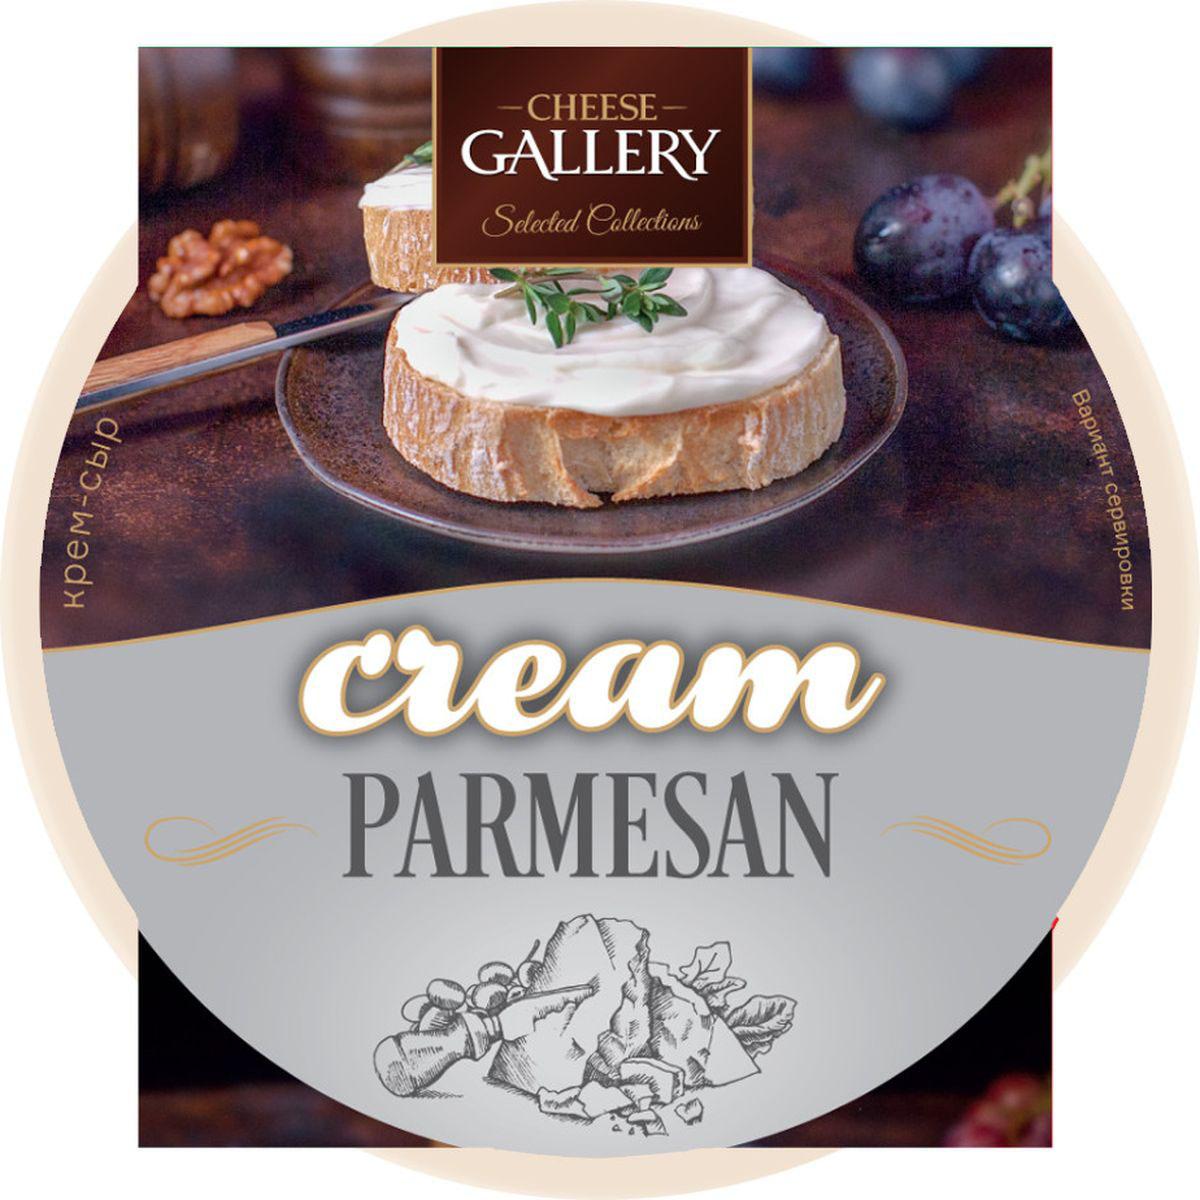 Cheese Gallery Parmesan Крем-сыр, 150 г сыр сheese gallery bluefort 56